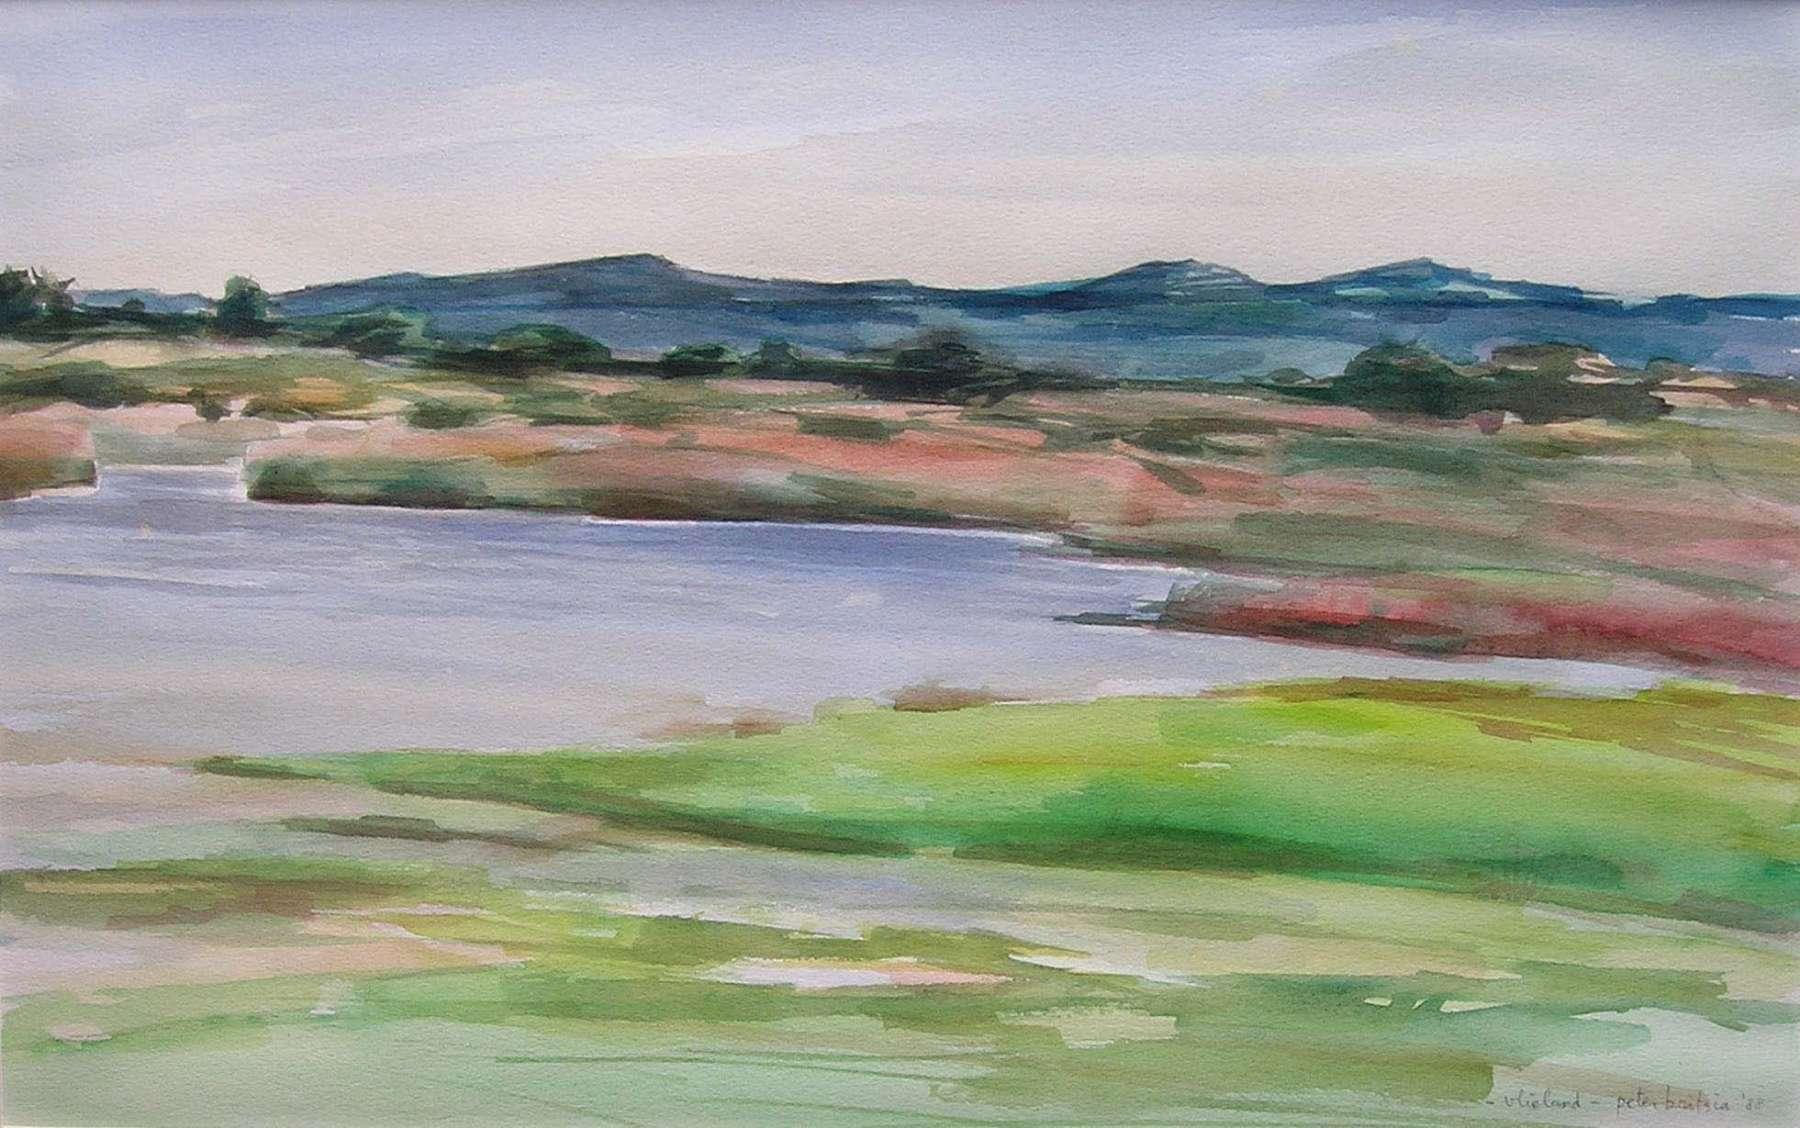 Kroonpolder Vlieland - aquarel - 65 x 50 cm.